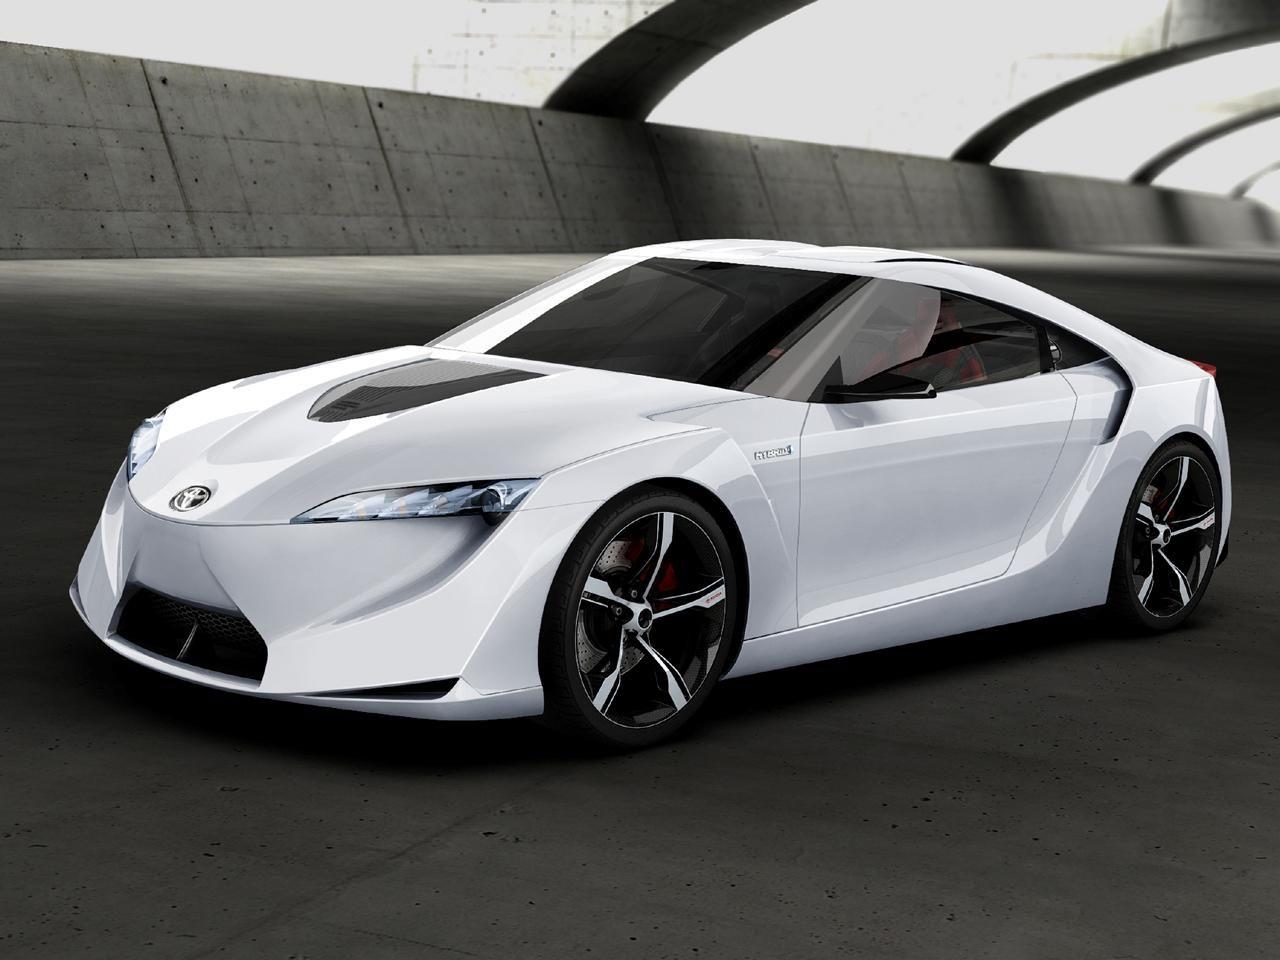 A Toyota Sports Car.